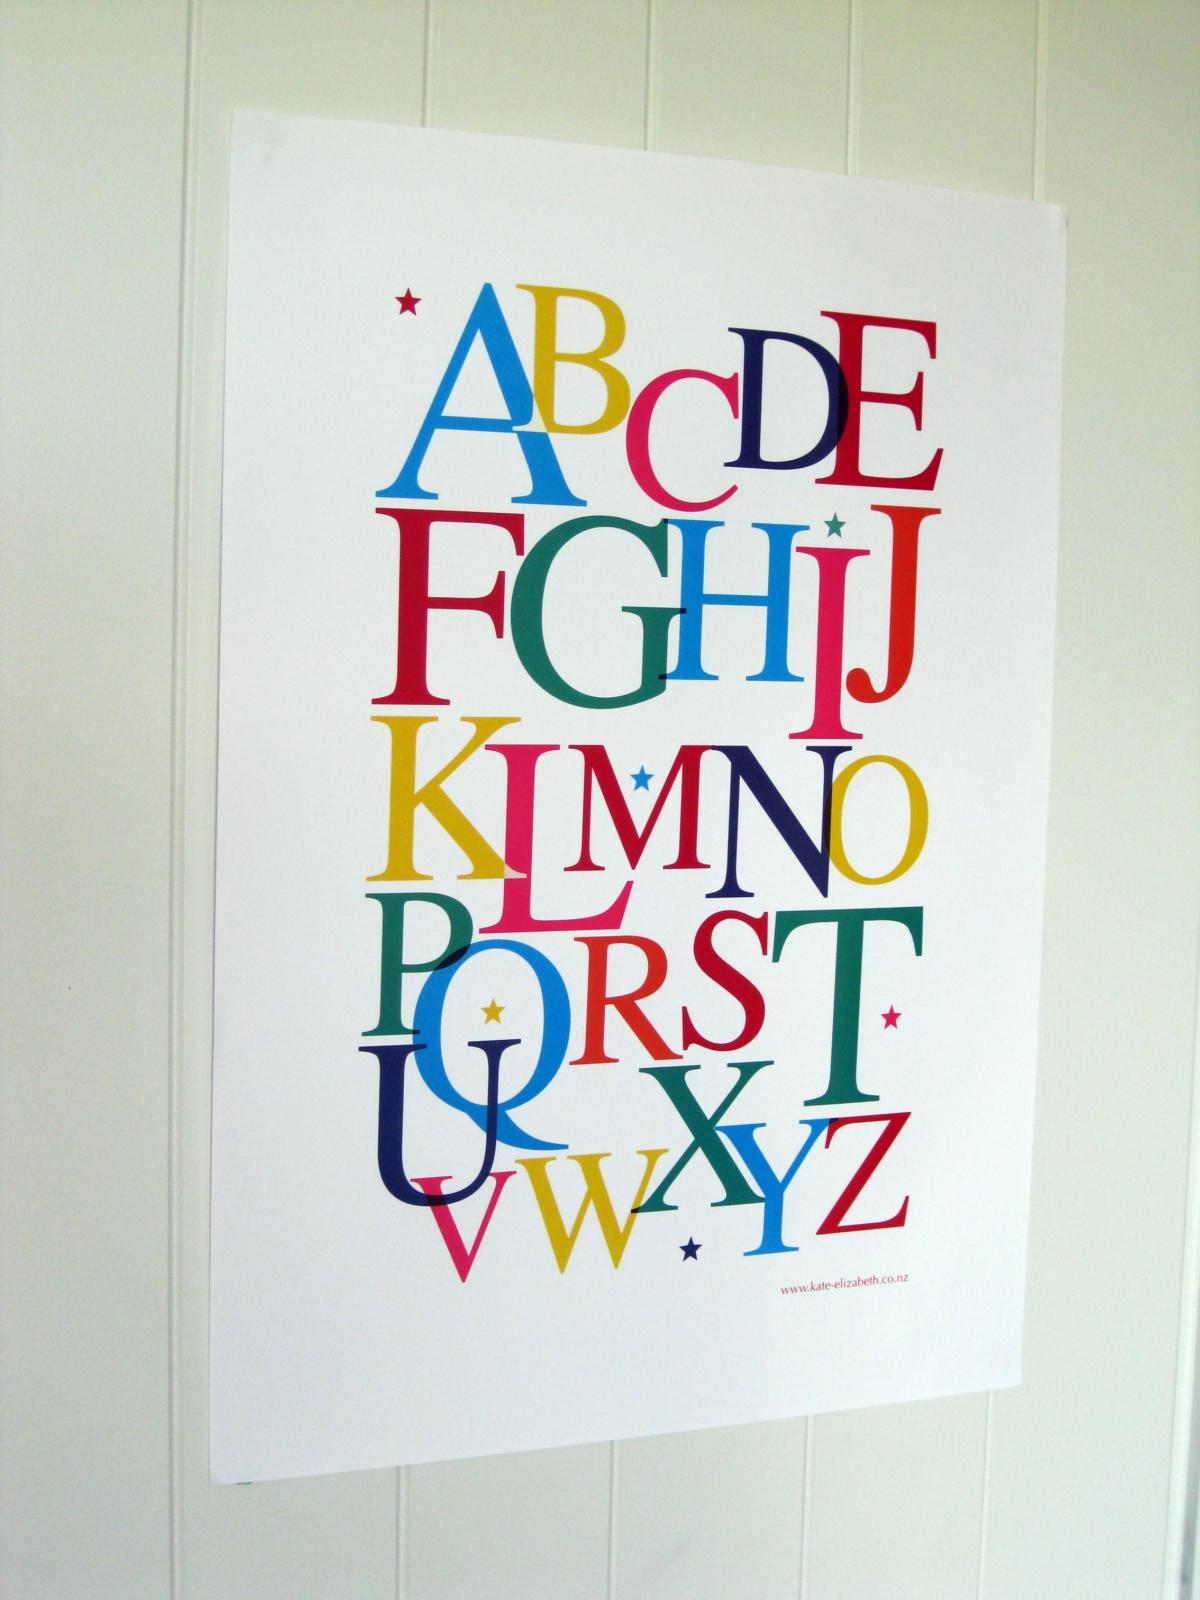 Large Abc Letters White Black: ABC Poster - Large A2 Size, Laminated.